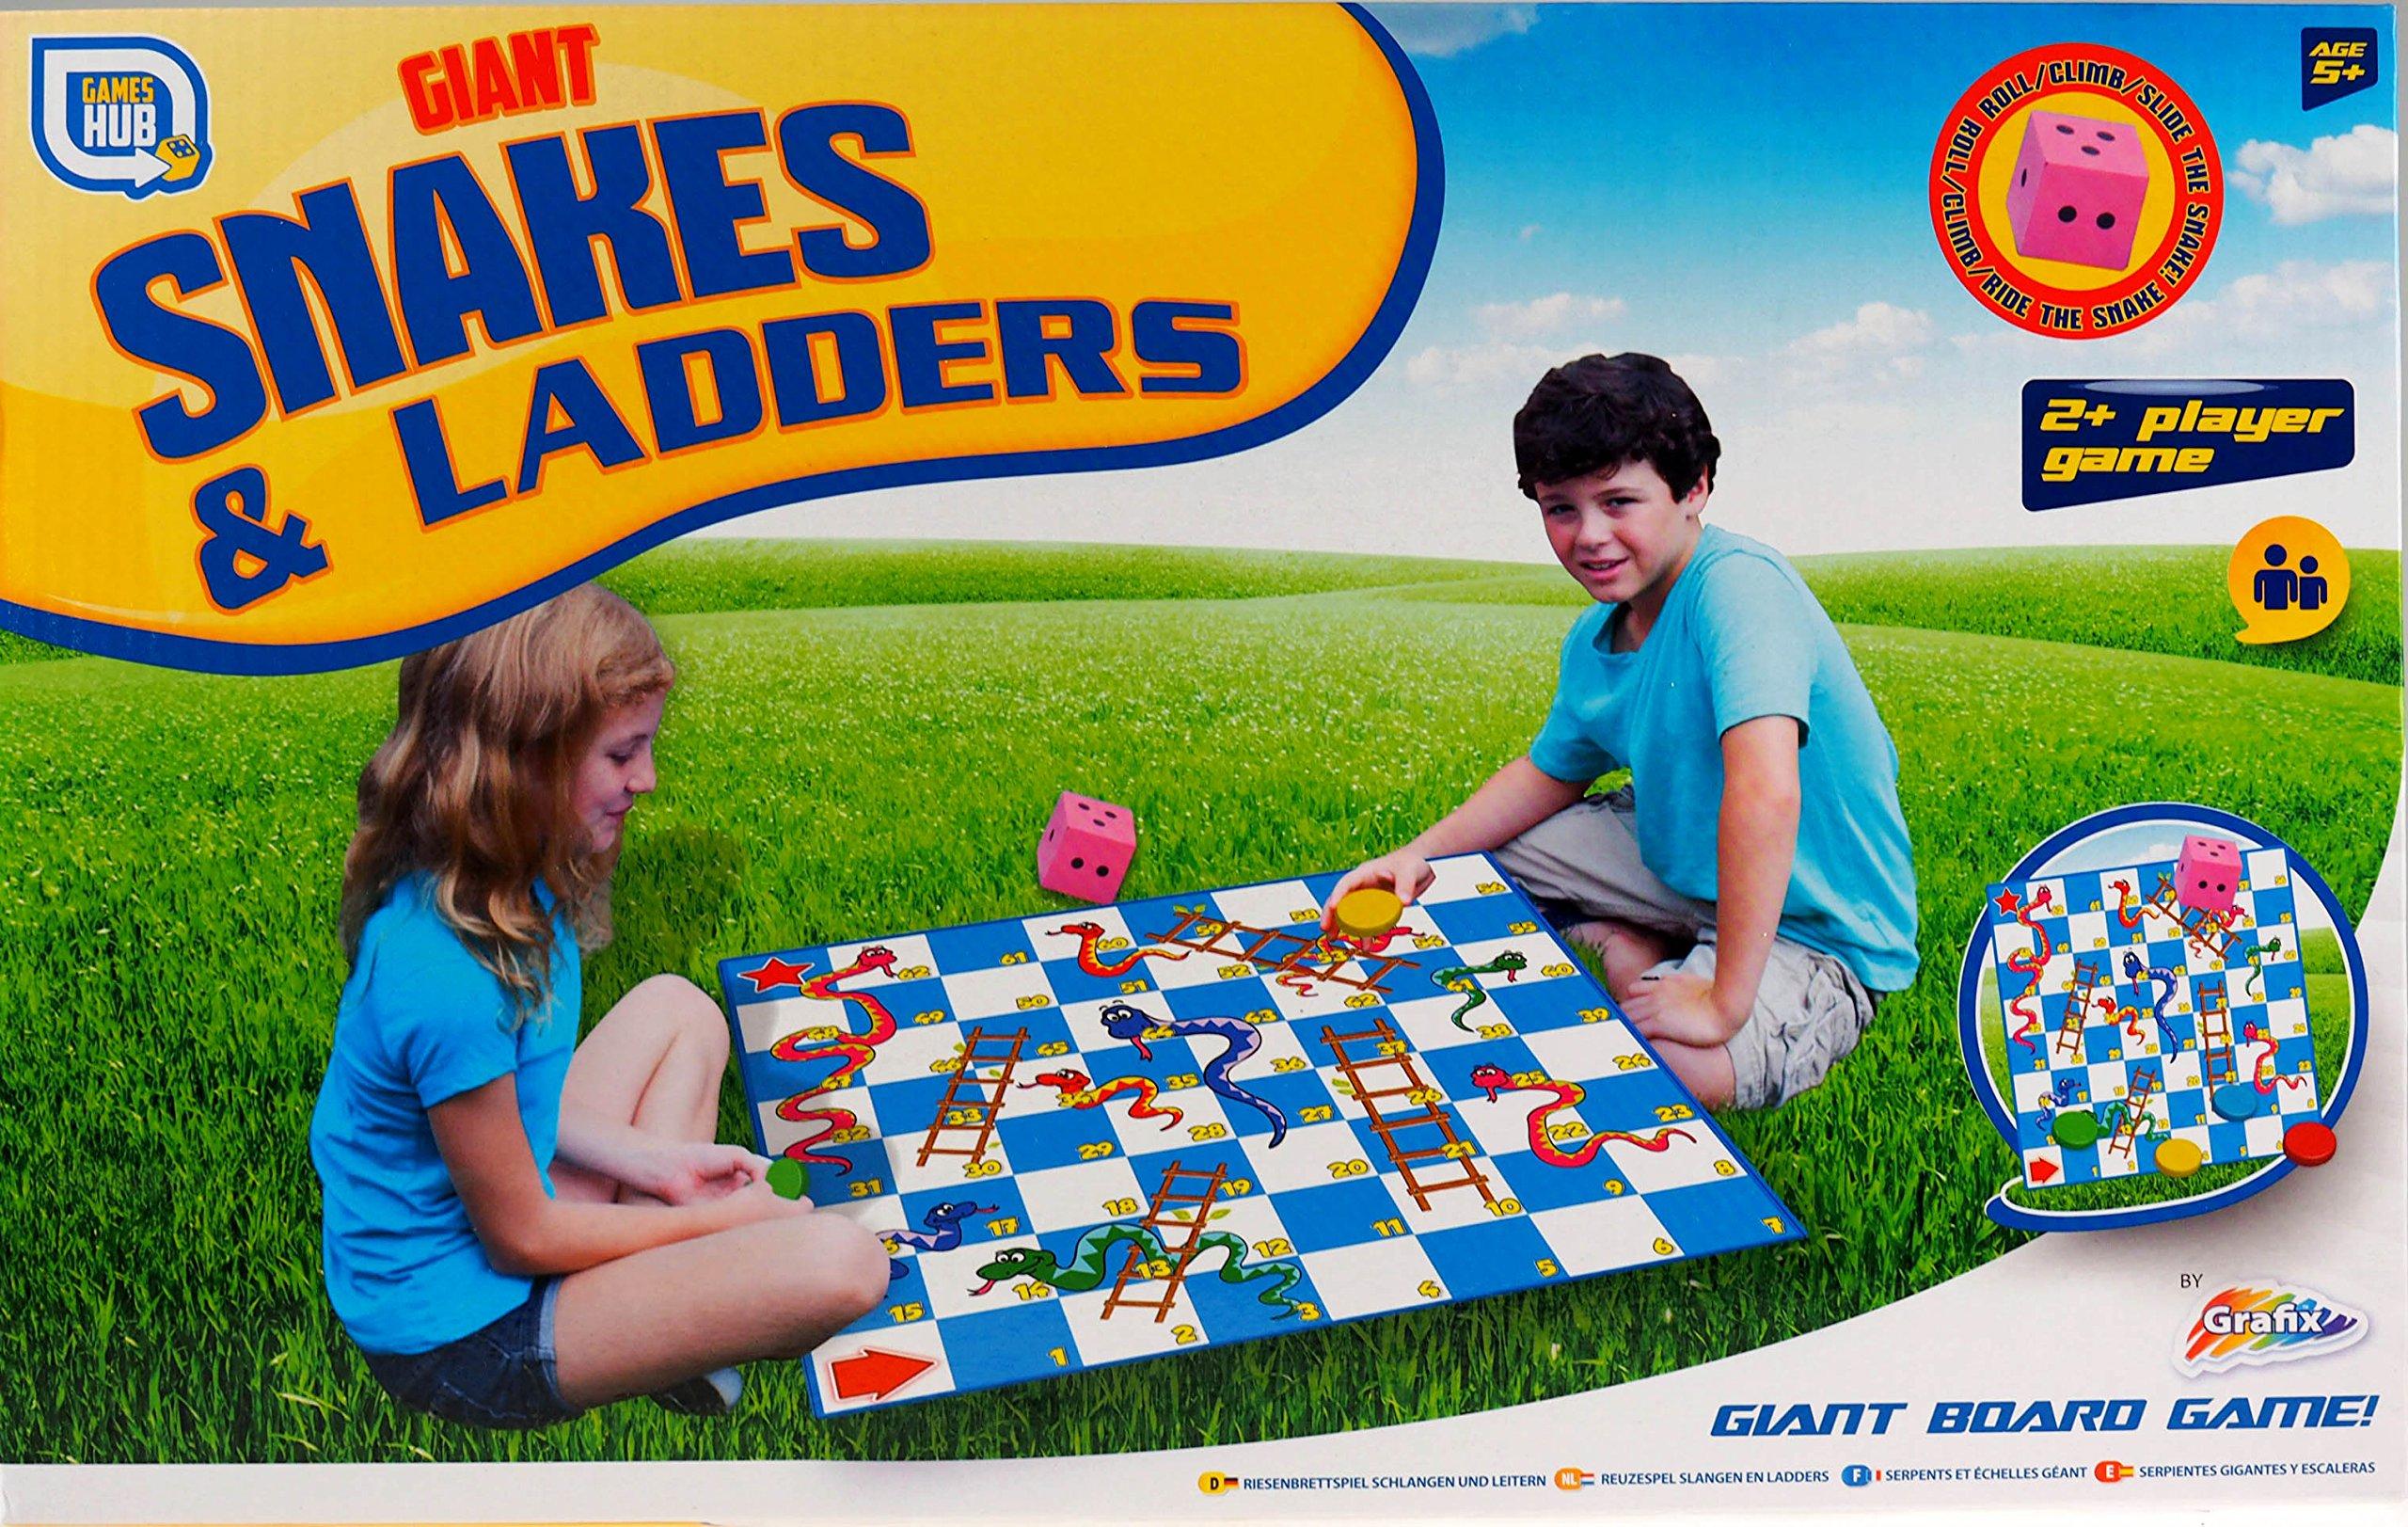 Juego de mesa infantil gigante Snakes and Ladders para jugar al aire libre: Amazon.es: Hogar